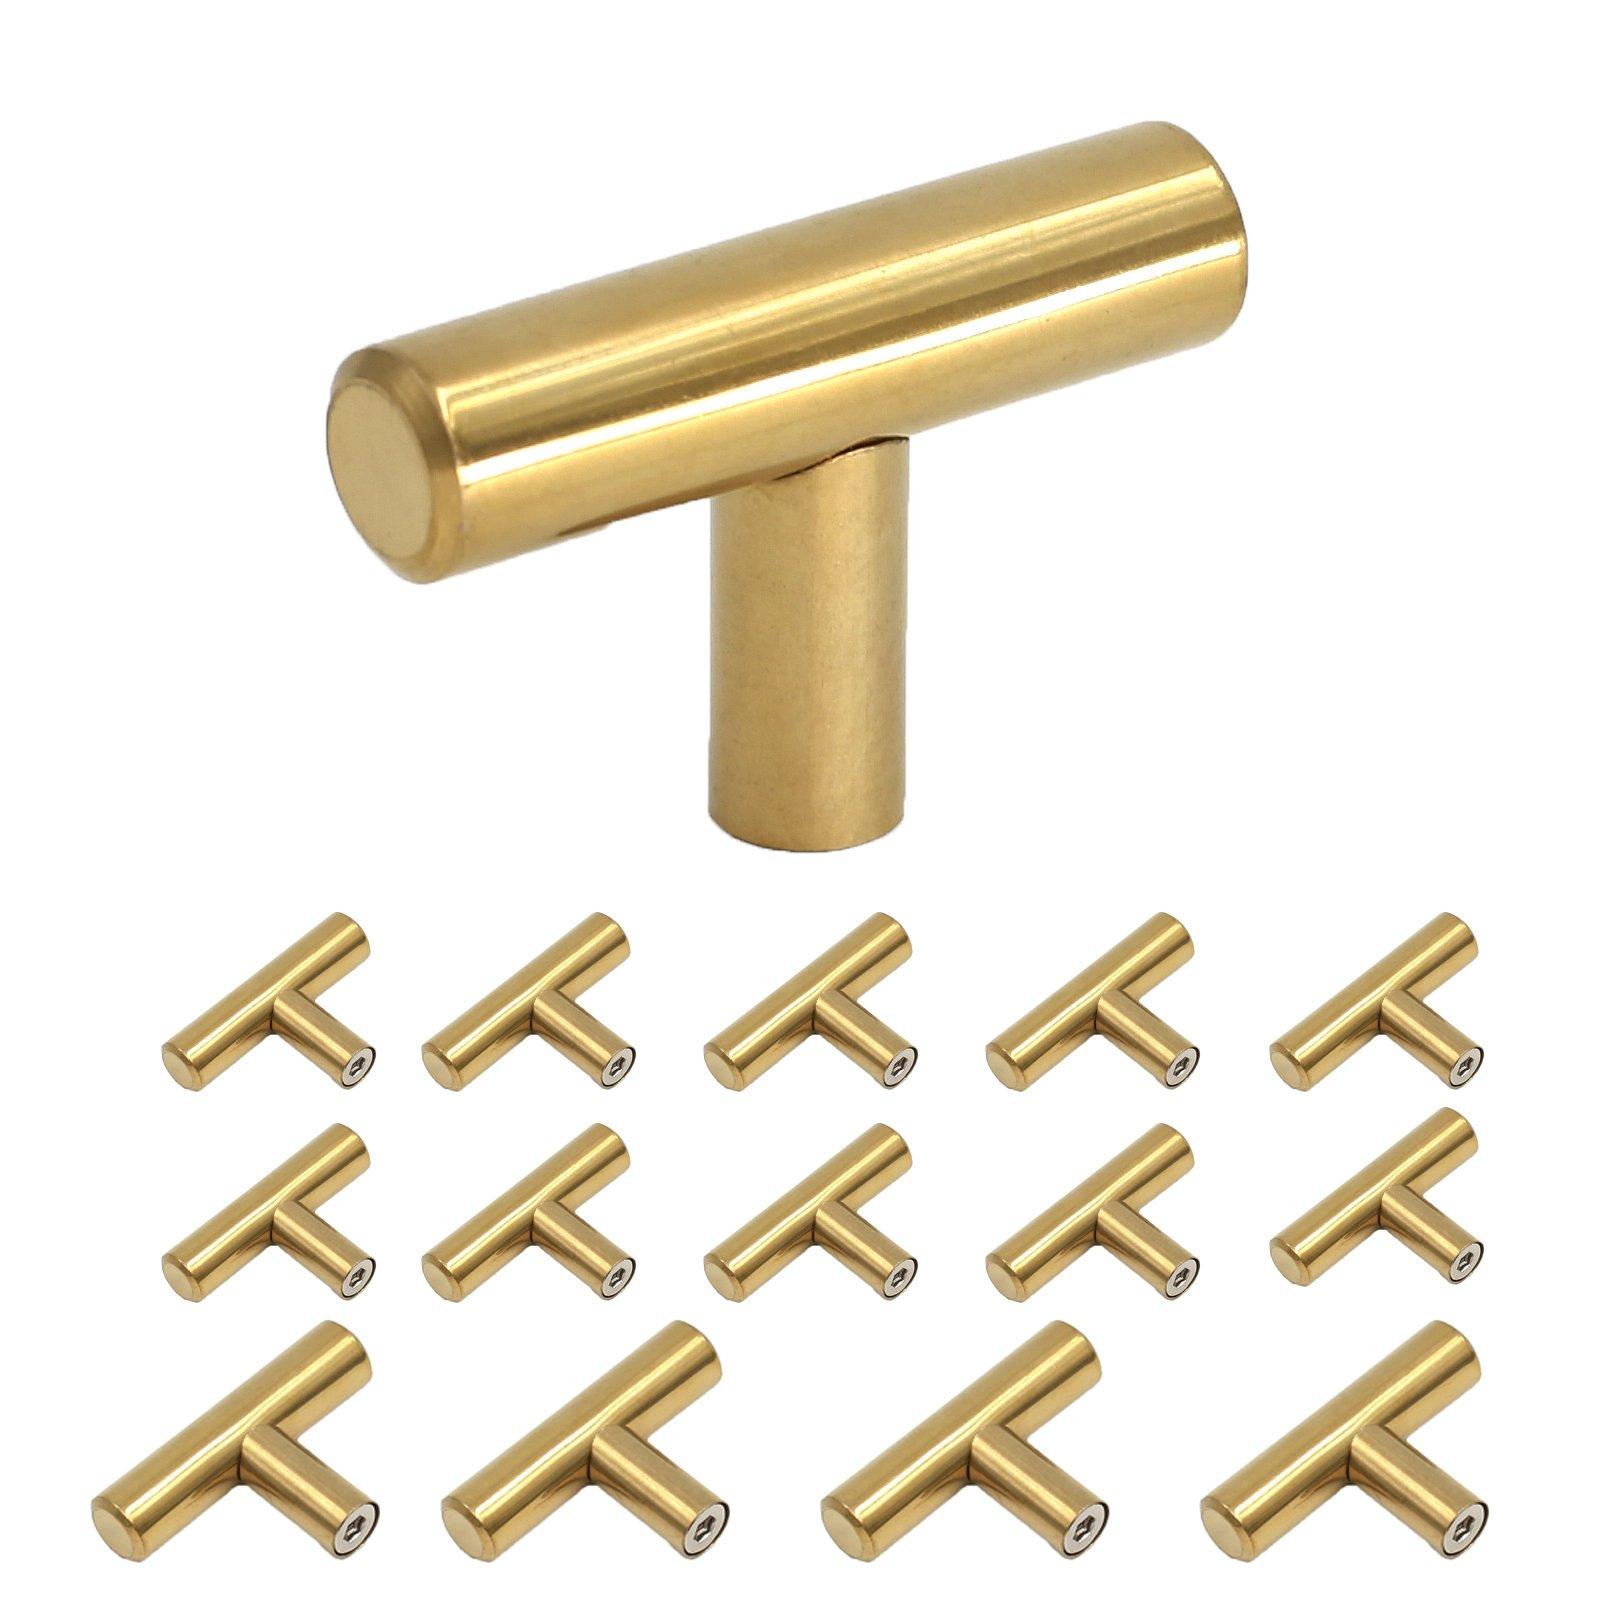 Homdiy Brushed Brass Cabinet Knobs 2in Modern Gold Kitchen Door Handles and Drawer Pulls Knobs 15 Pack